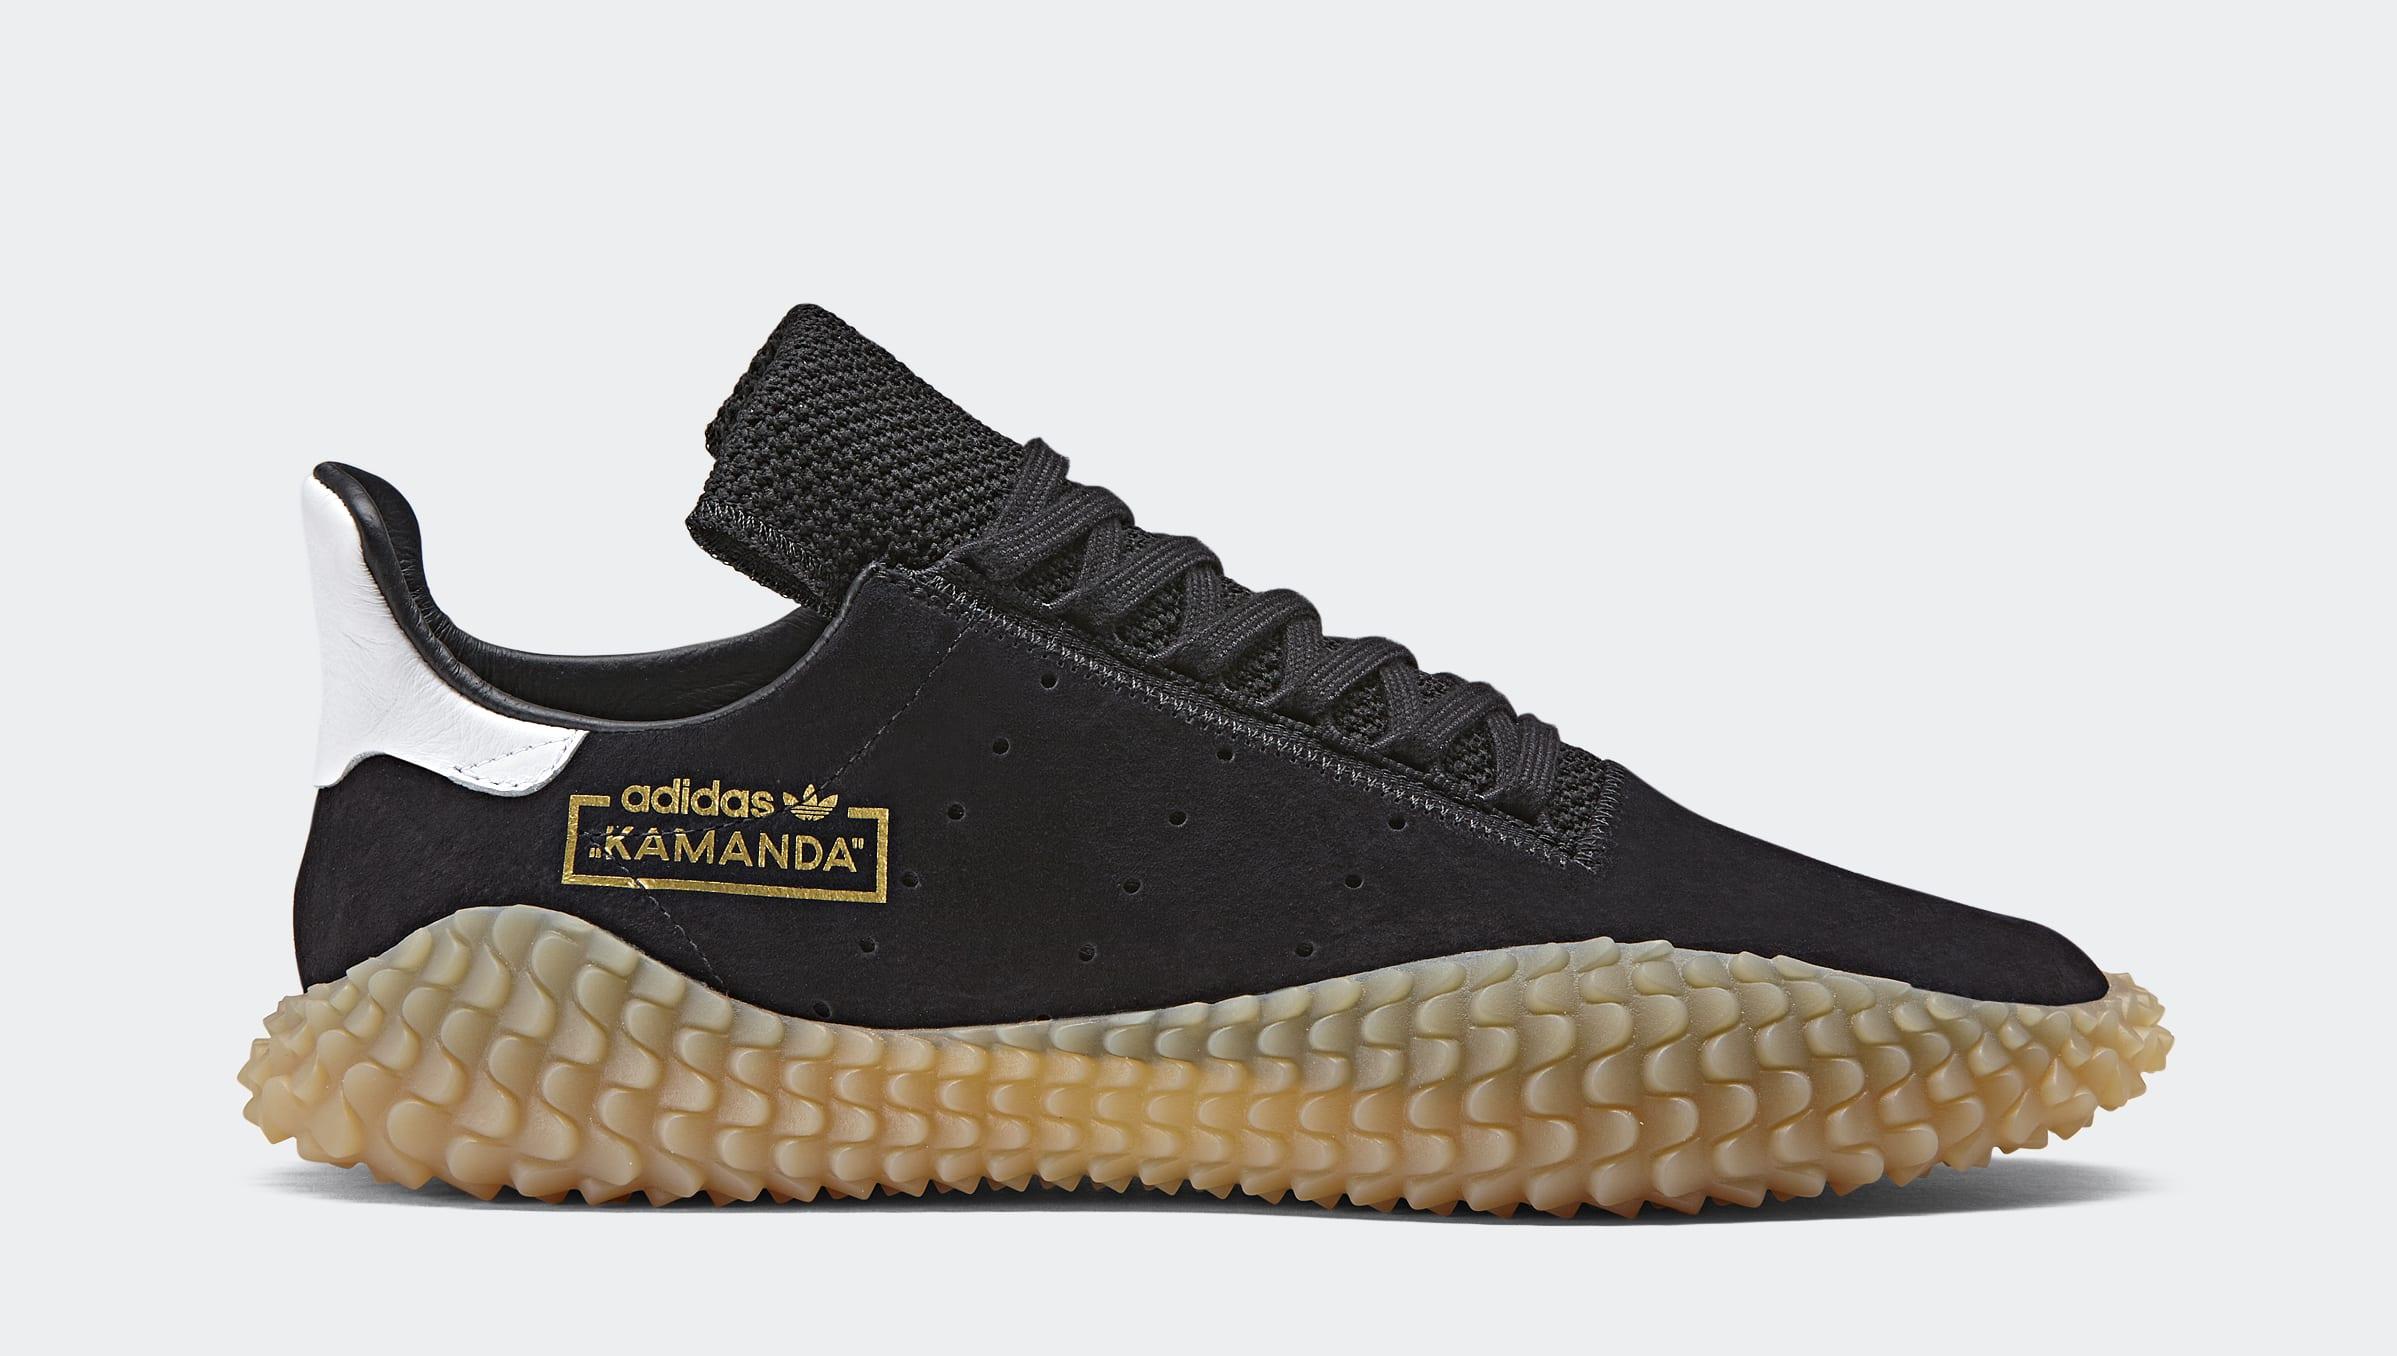 Adidas Kamanda 'Black/Gum' CQ2220 (Lateral)